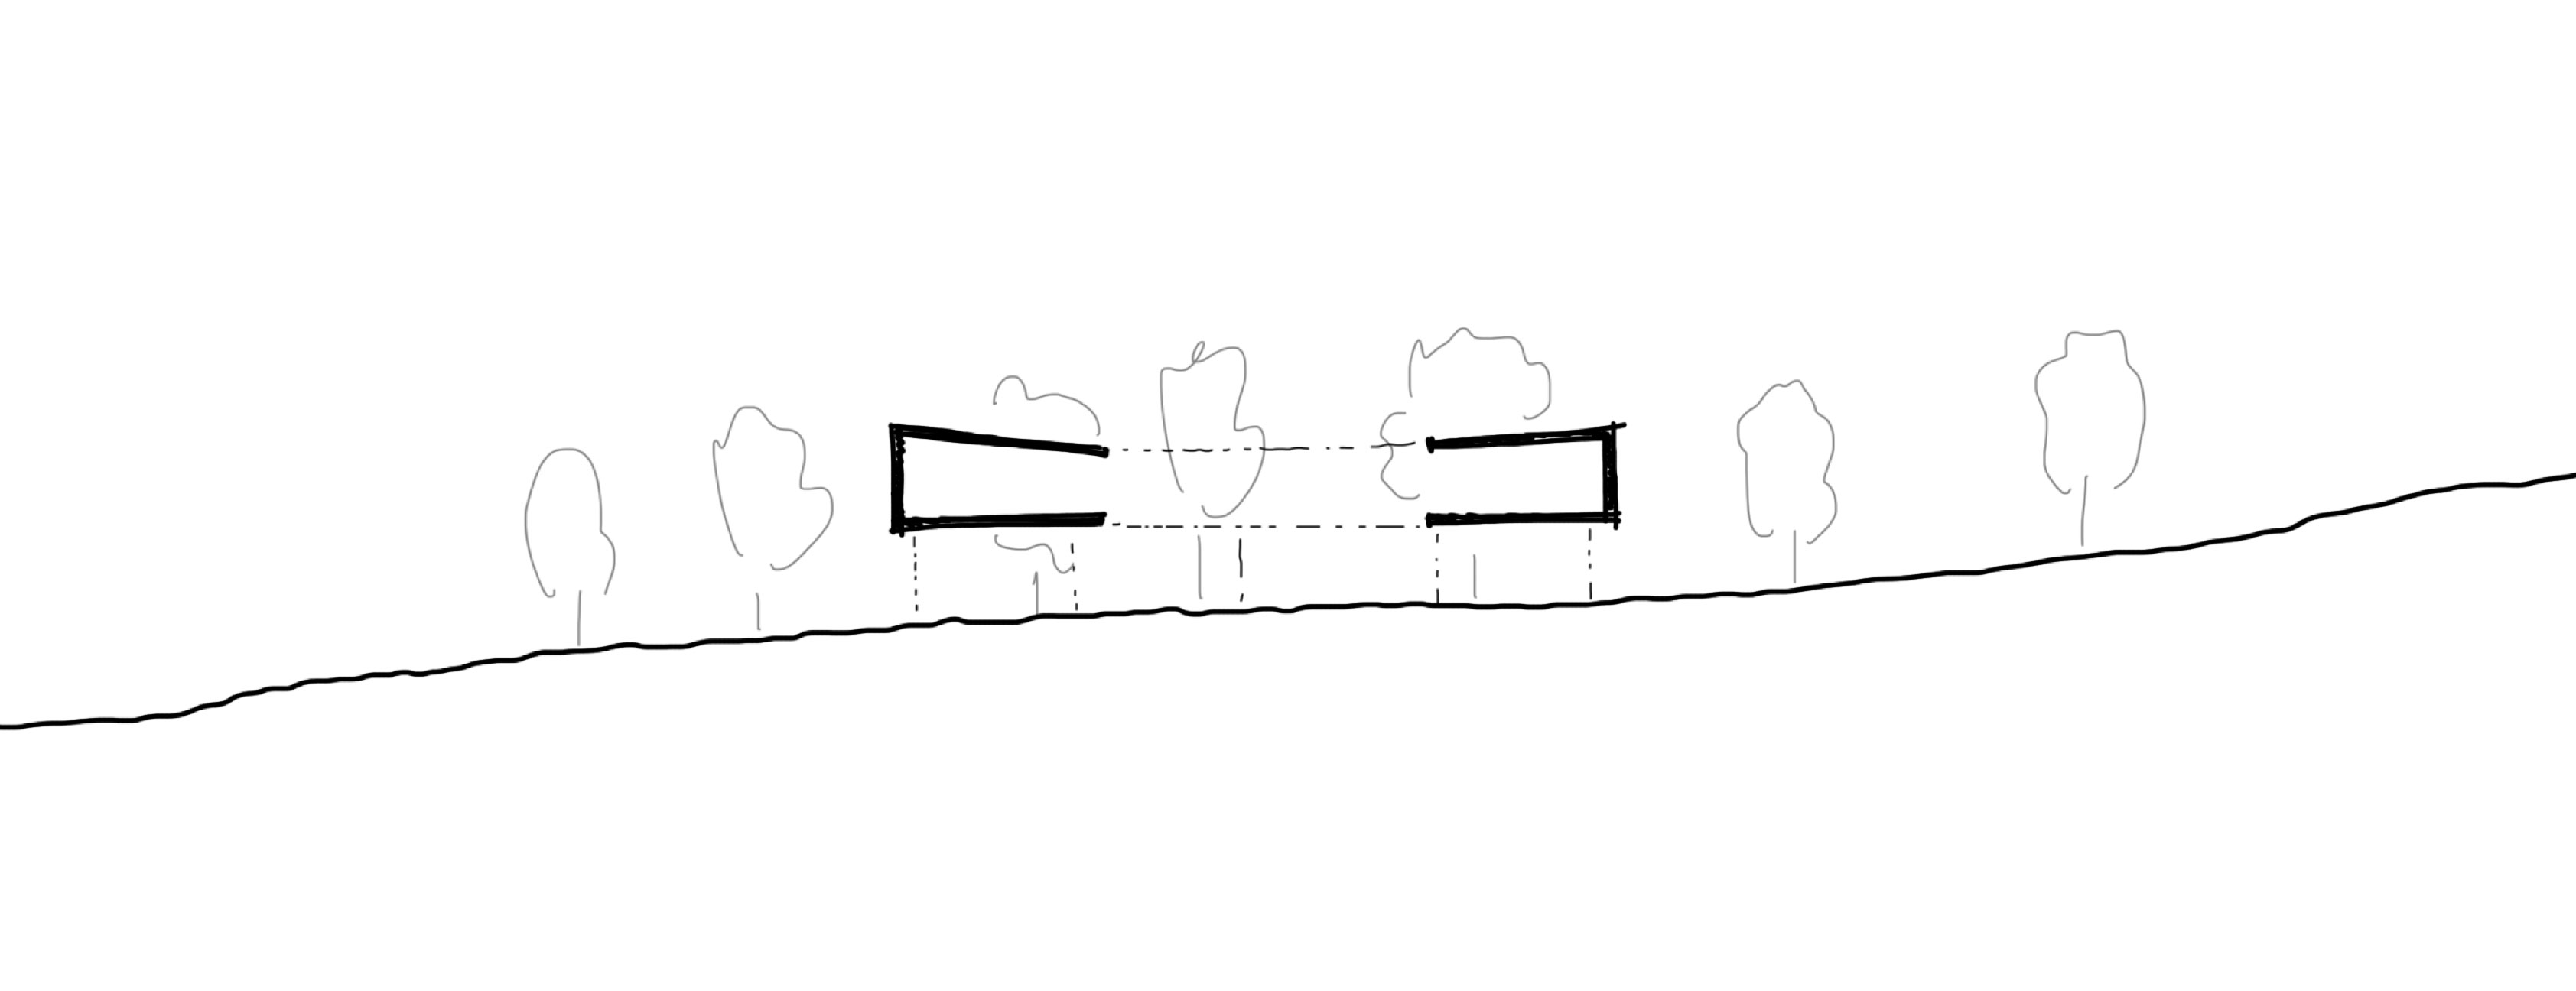 STUDIOKUBIK-KUBIK-architektur-architecture-berlin-RMP-skizze-konzeptskizze-concept-sketch